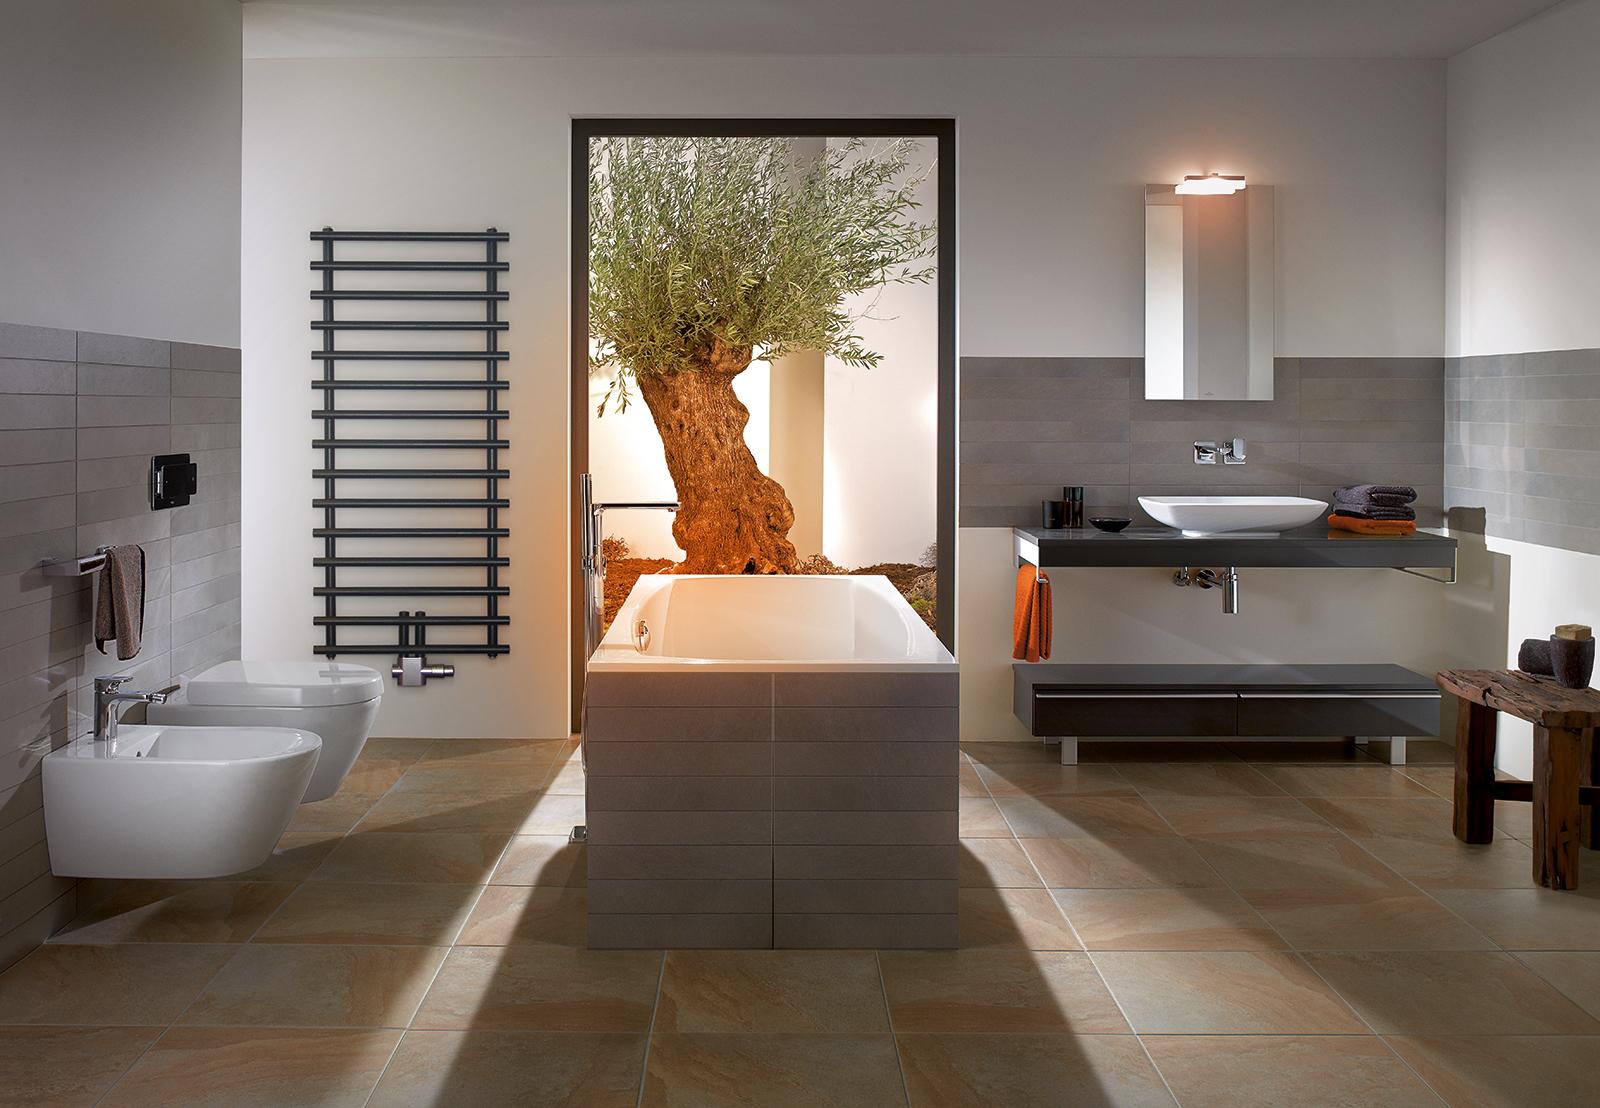 Bathroom-Campaign-Leros-Landscape-Wall-M